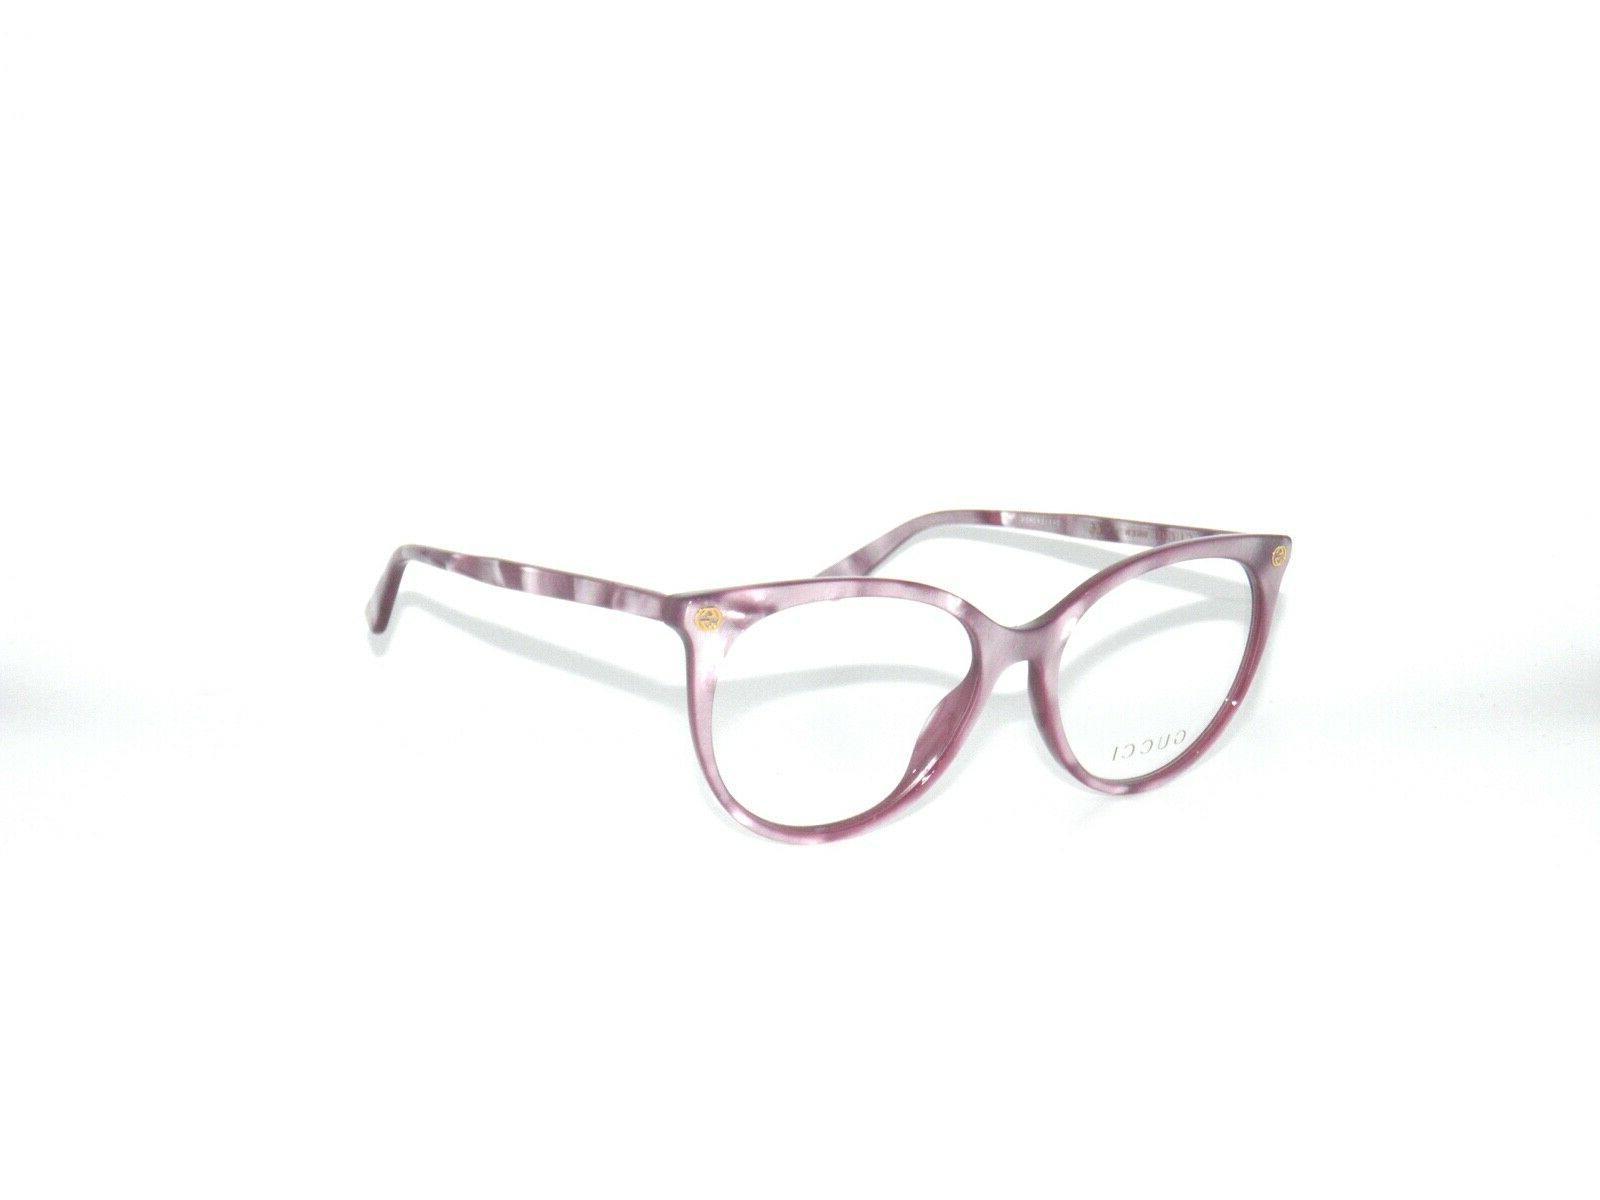 eyeglasses gg 0093 o 004 pink